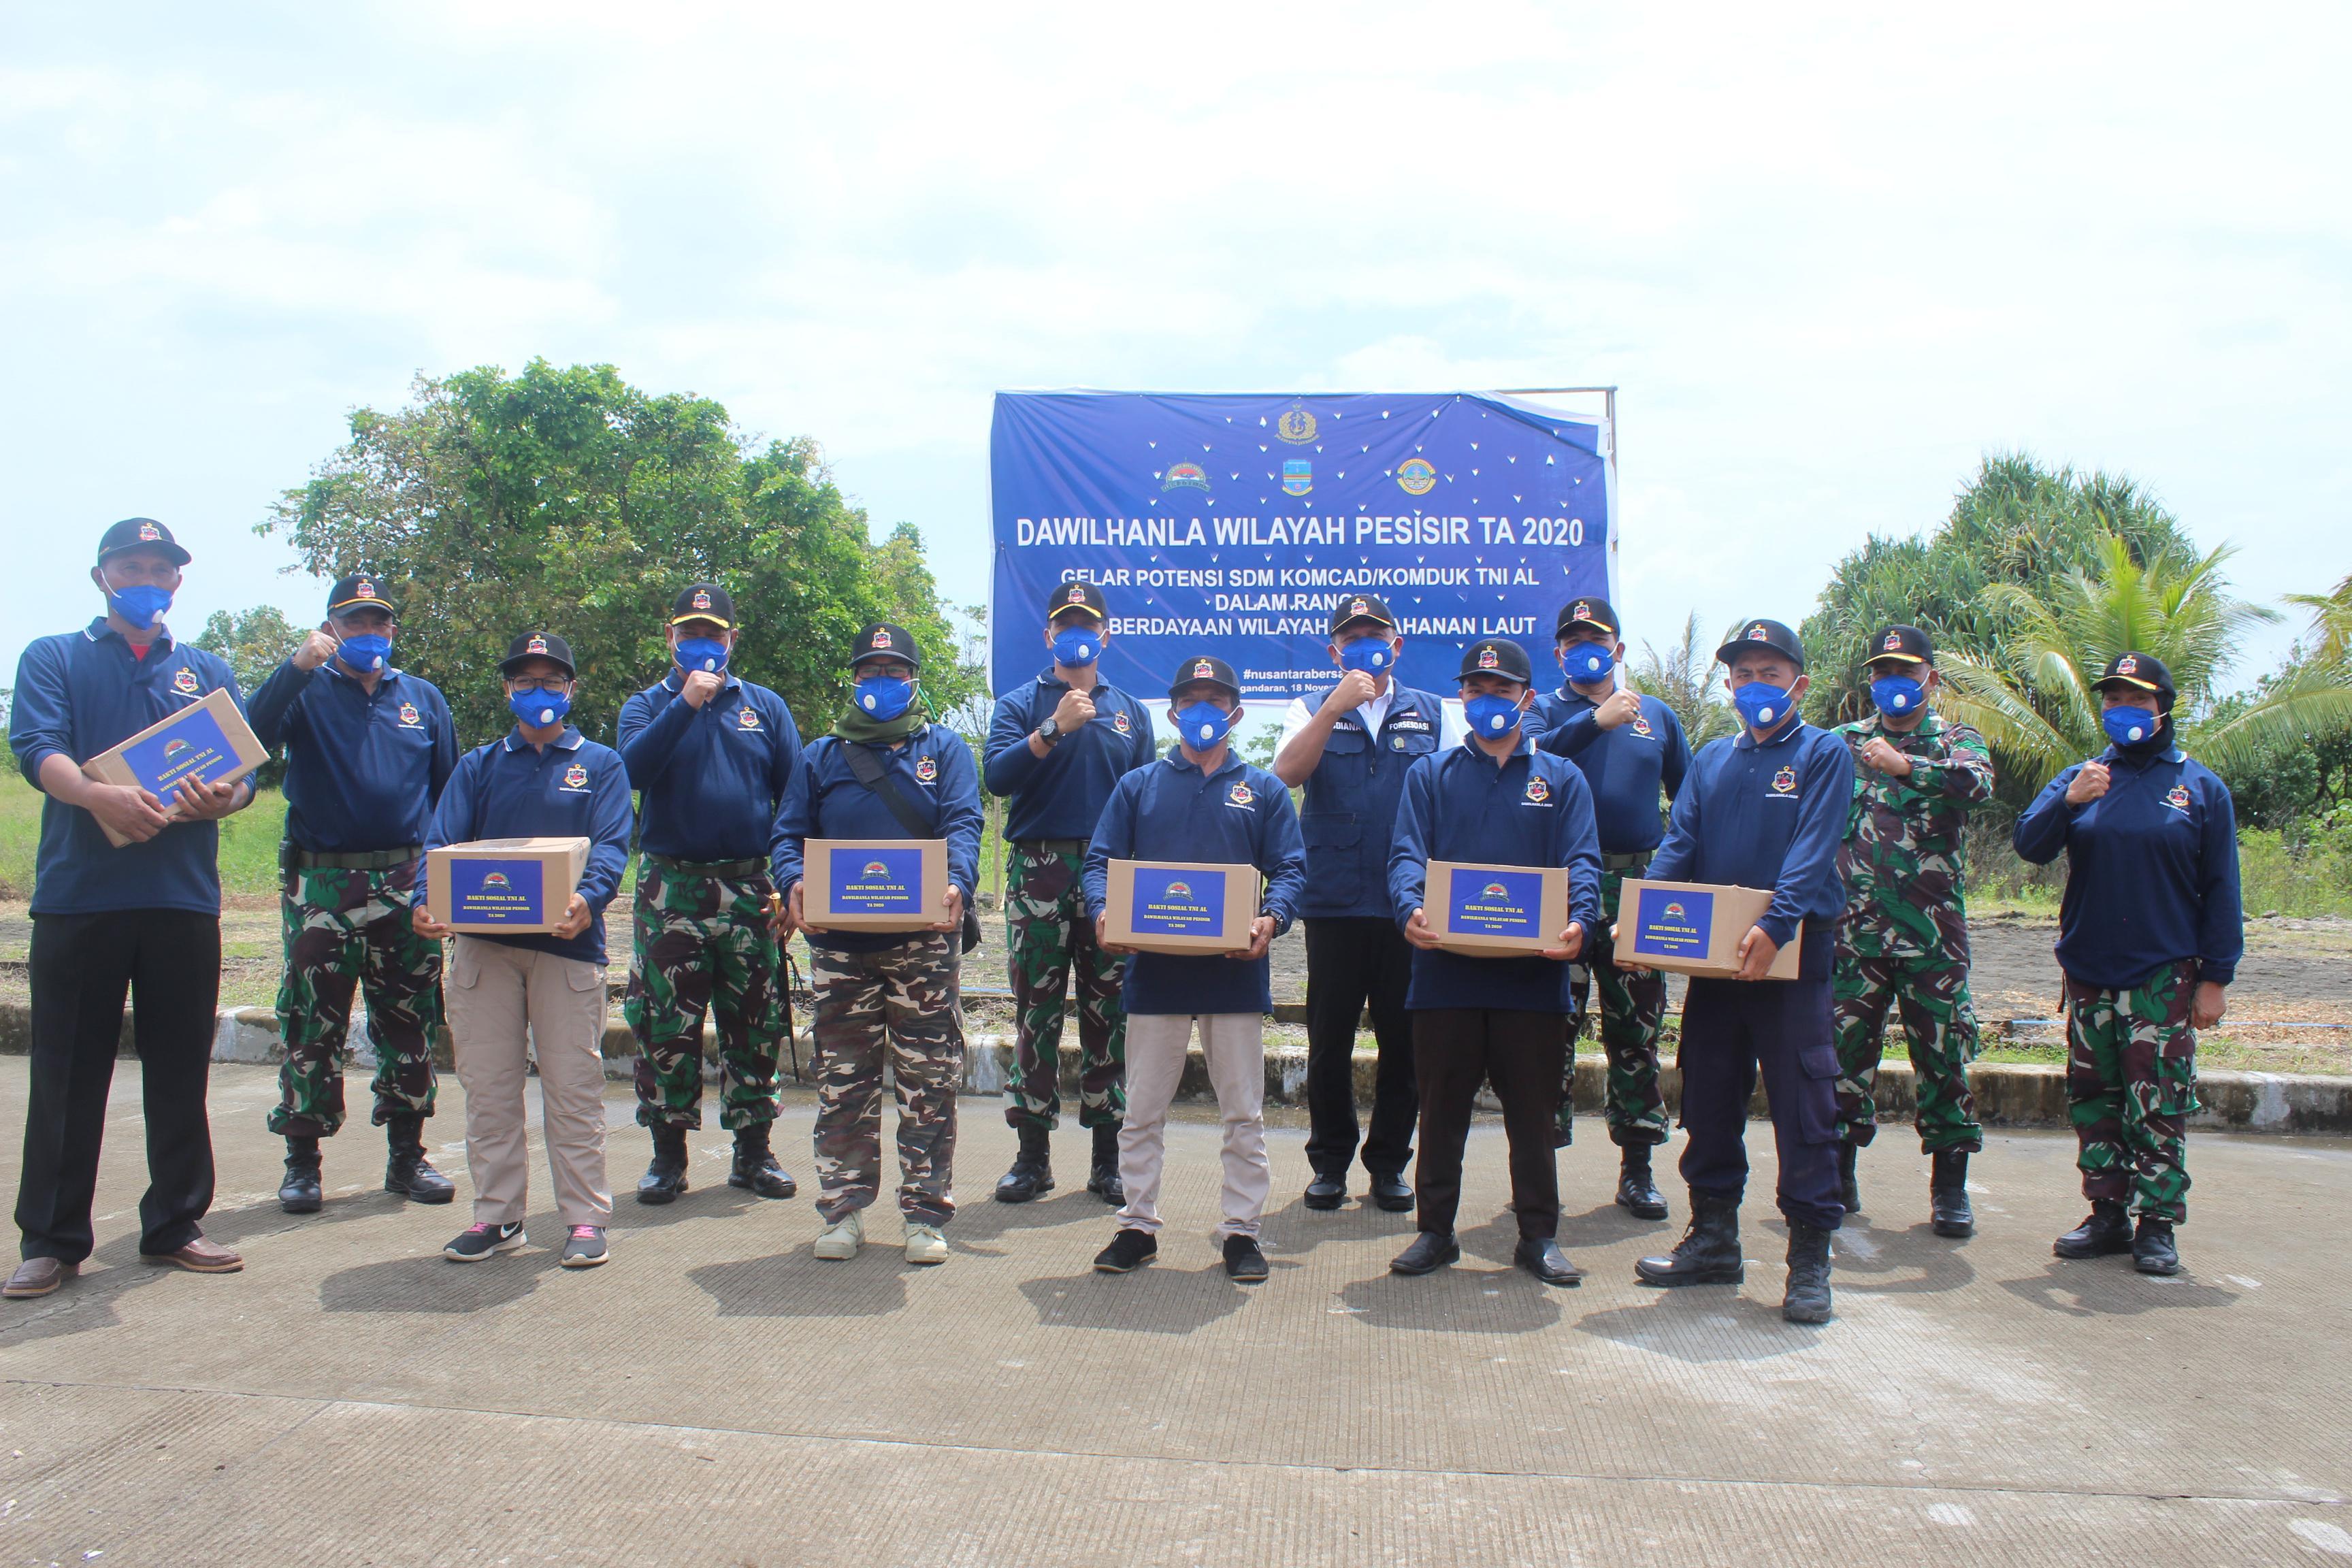 4 Daerah Di Indonesia Gelar Apel KOMCAD KOMDUK TNI AL, Pangandaran Salah Satunya